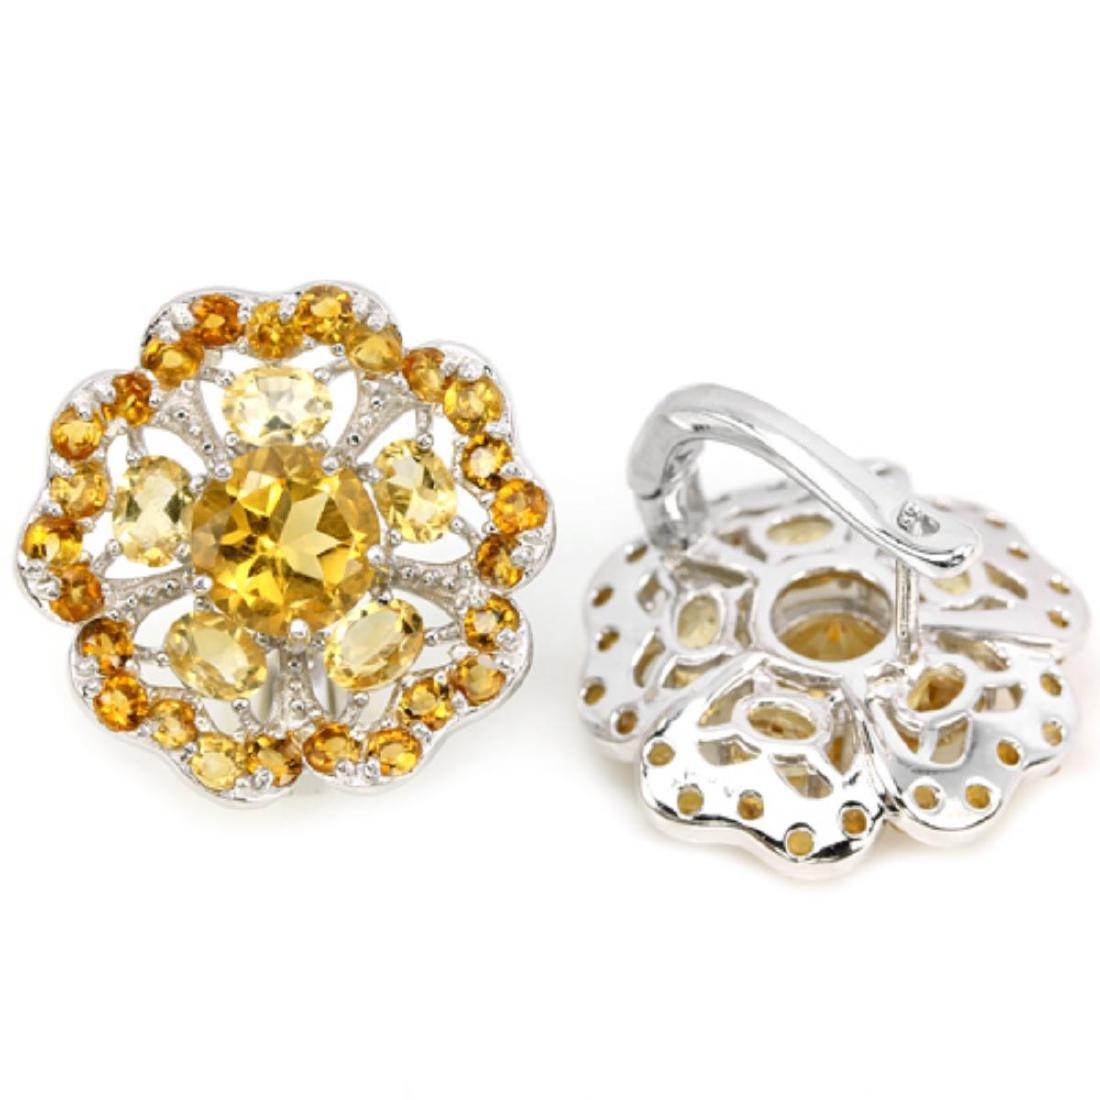 NATURAL ORANGISH YELLOW CITRINE Earrings - 3